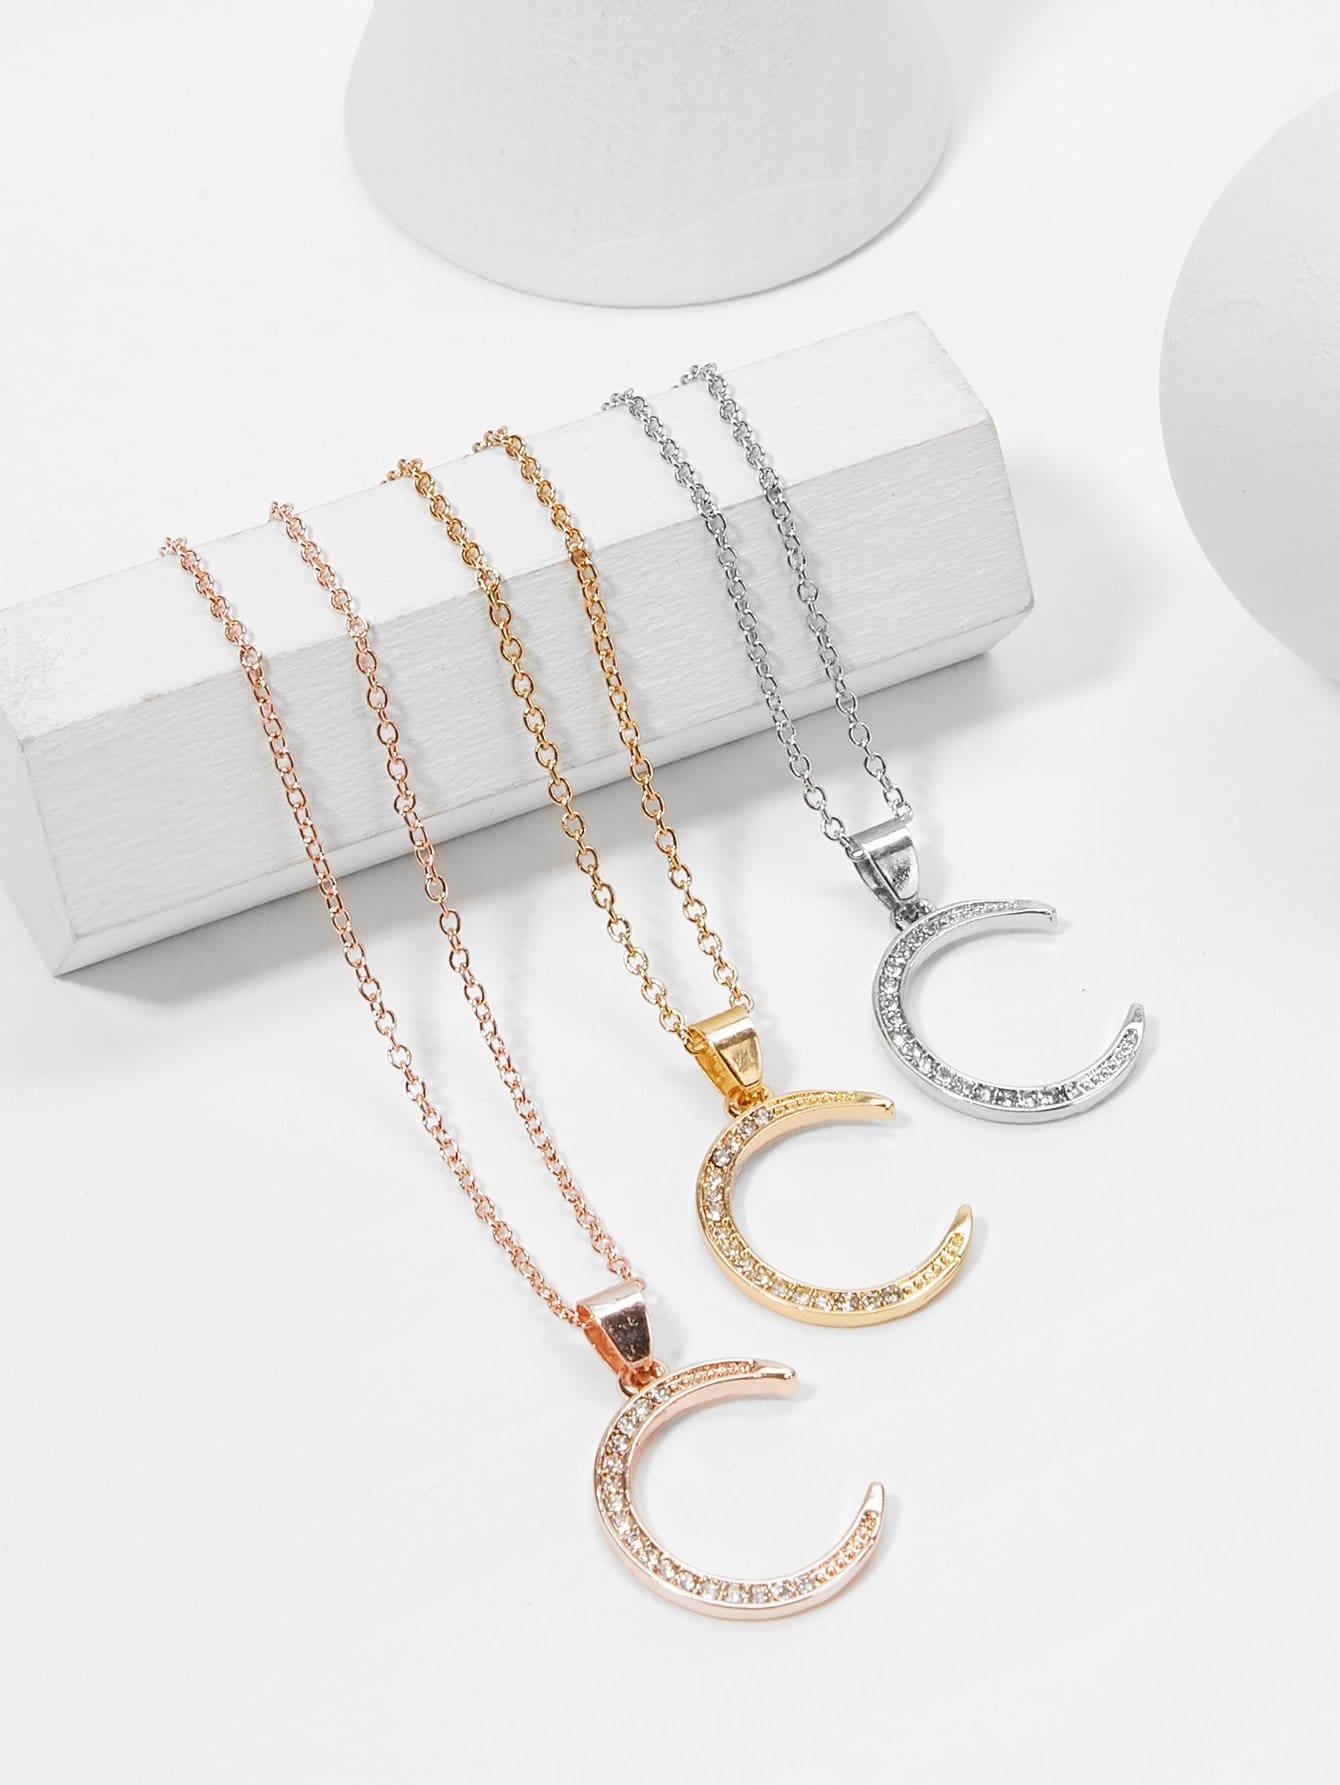 Rhinestone Moon Pendant Necklace Set 3pcs hollow heart pendant necklace set 3pcs